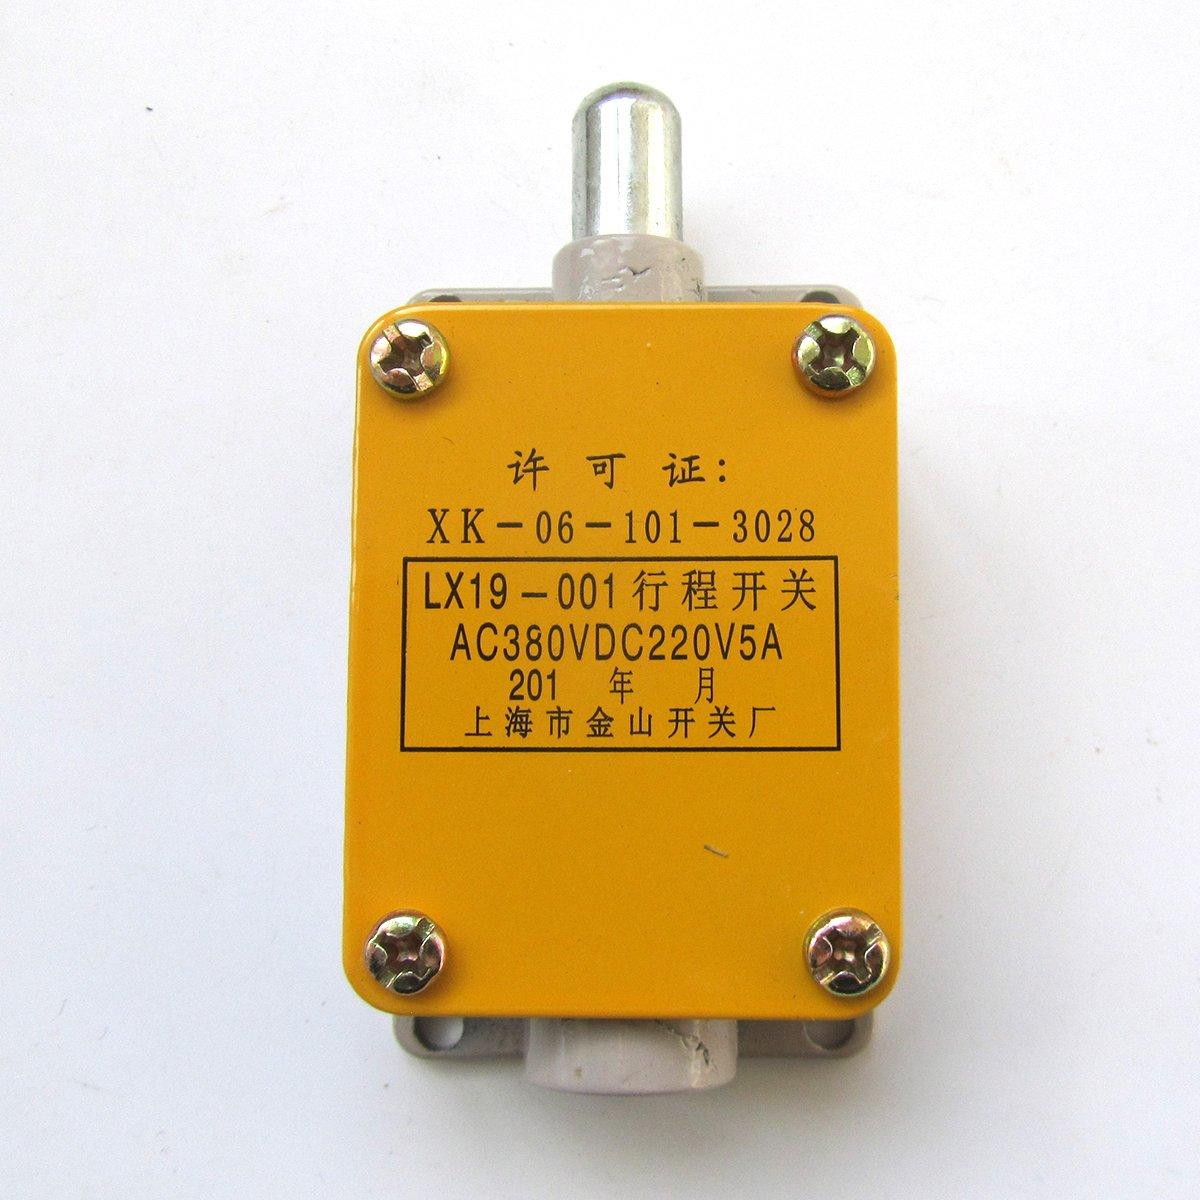 cong-tac-lx19-001